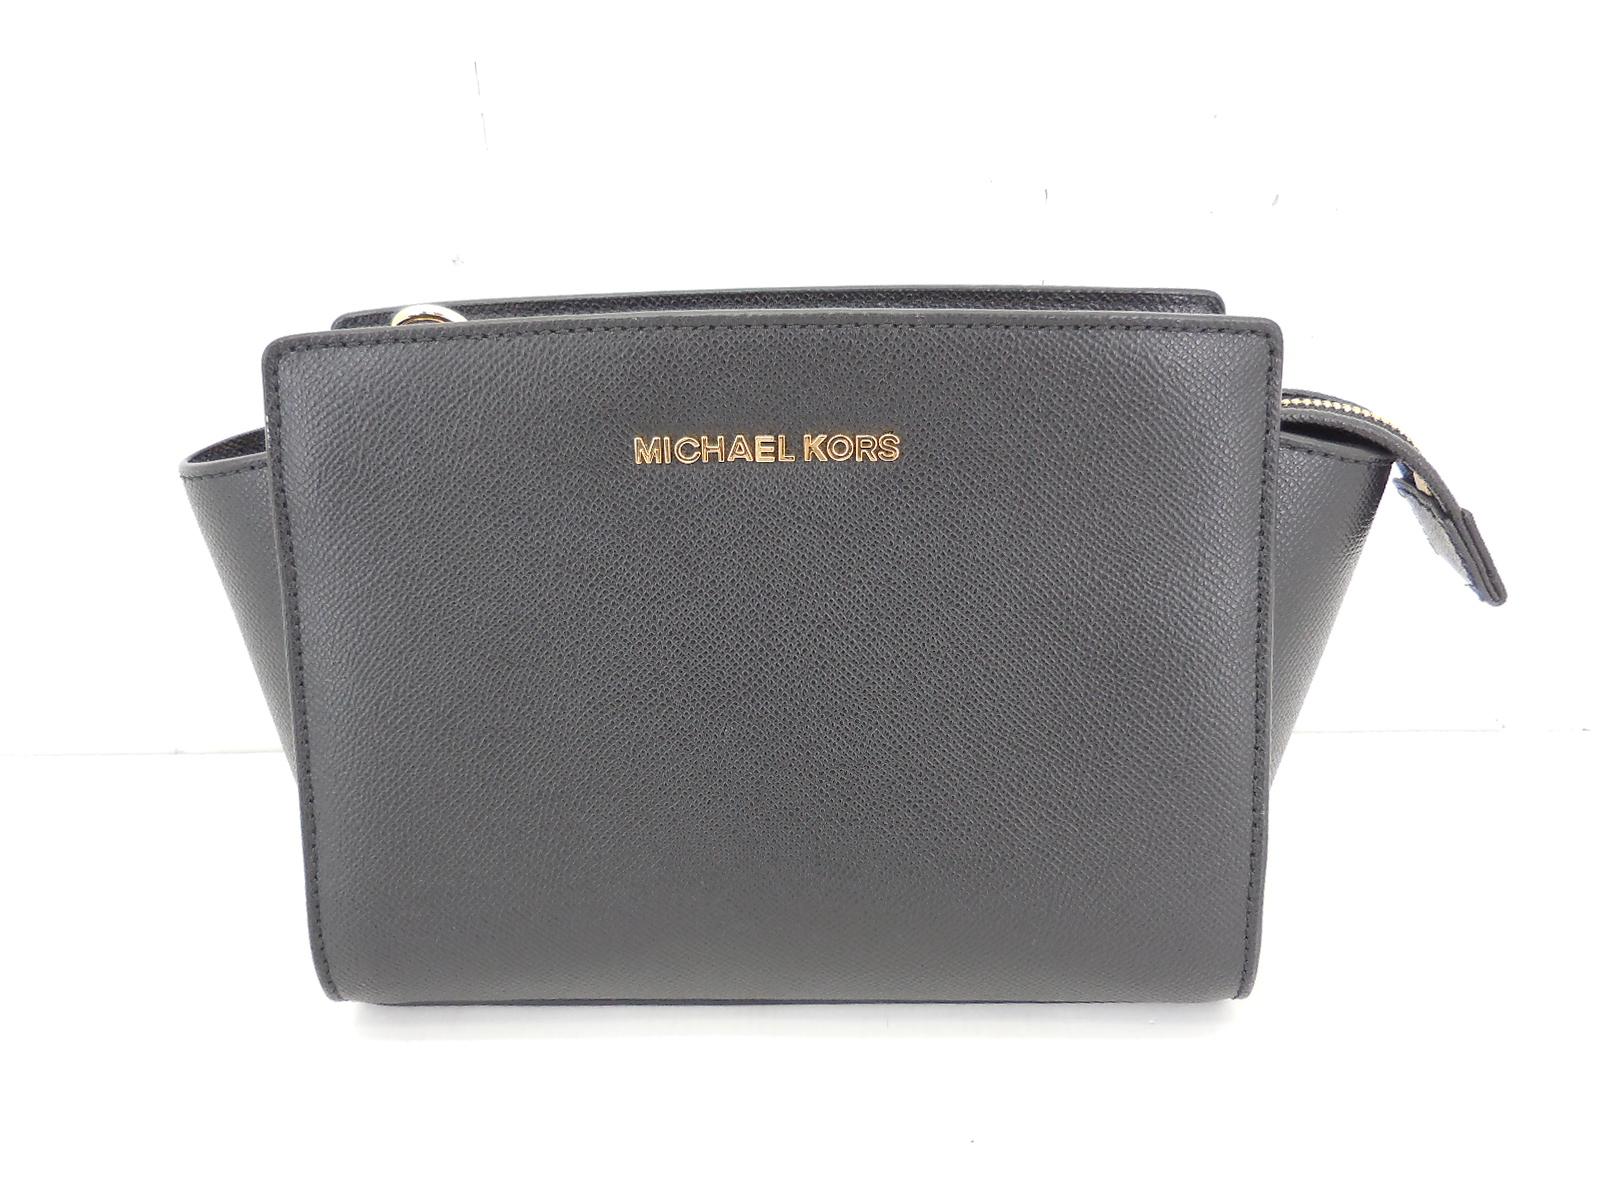 MICHAEL KORS Shoulder BAG マイケルコース ショルダーバッグ メッセンジャーバッグ ブラック 30T3GLMM2L JSB鑑定済み